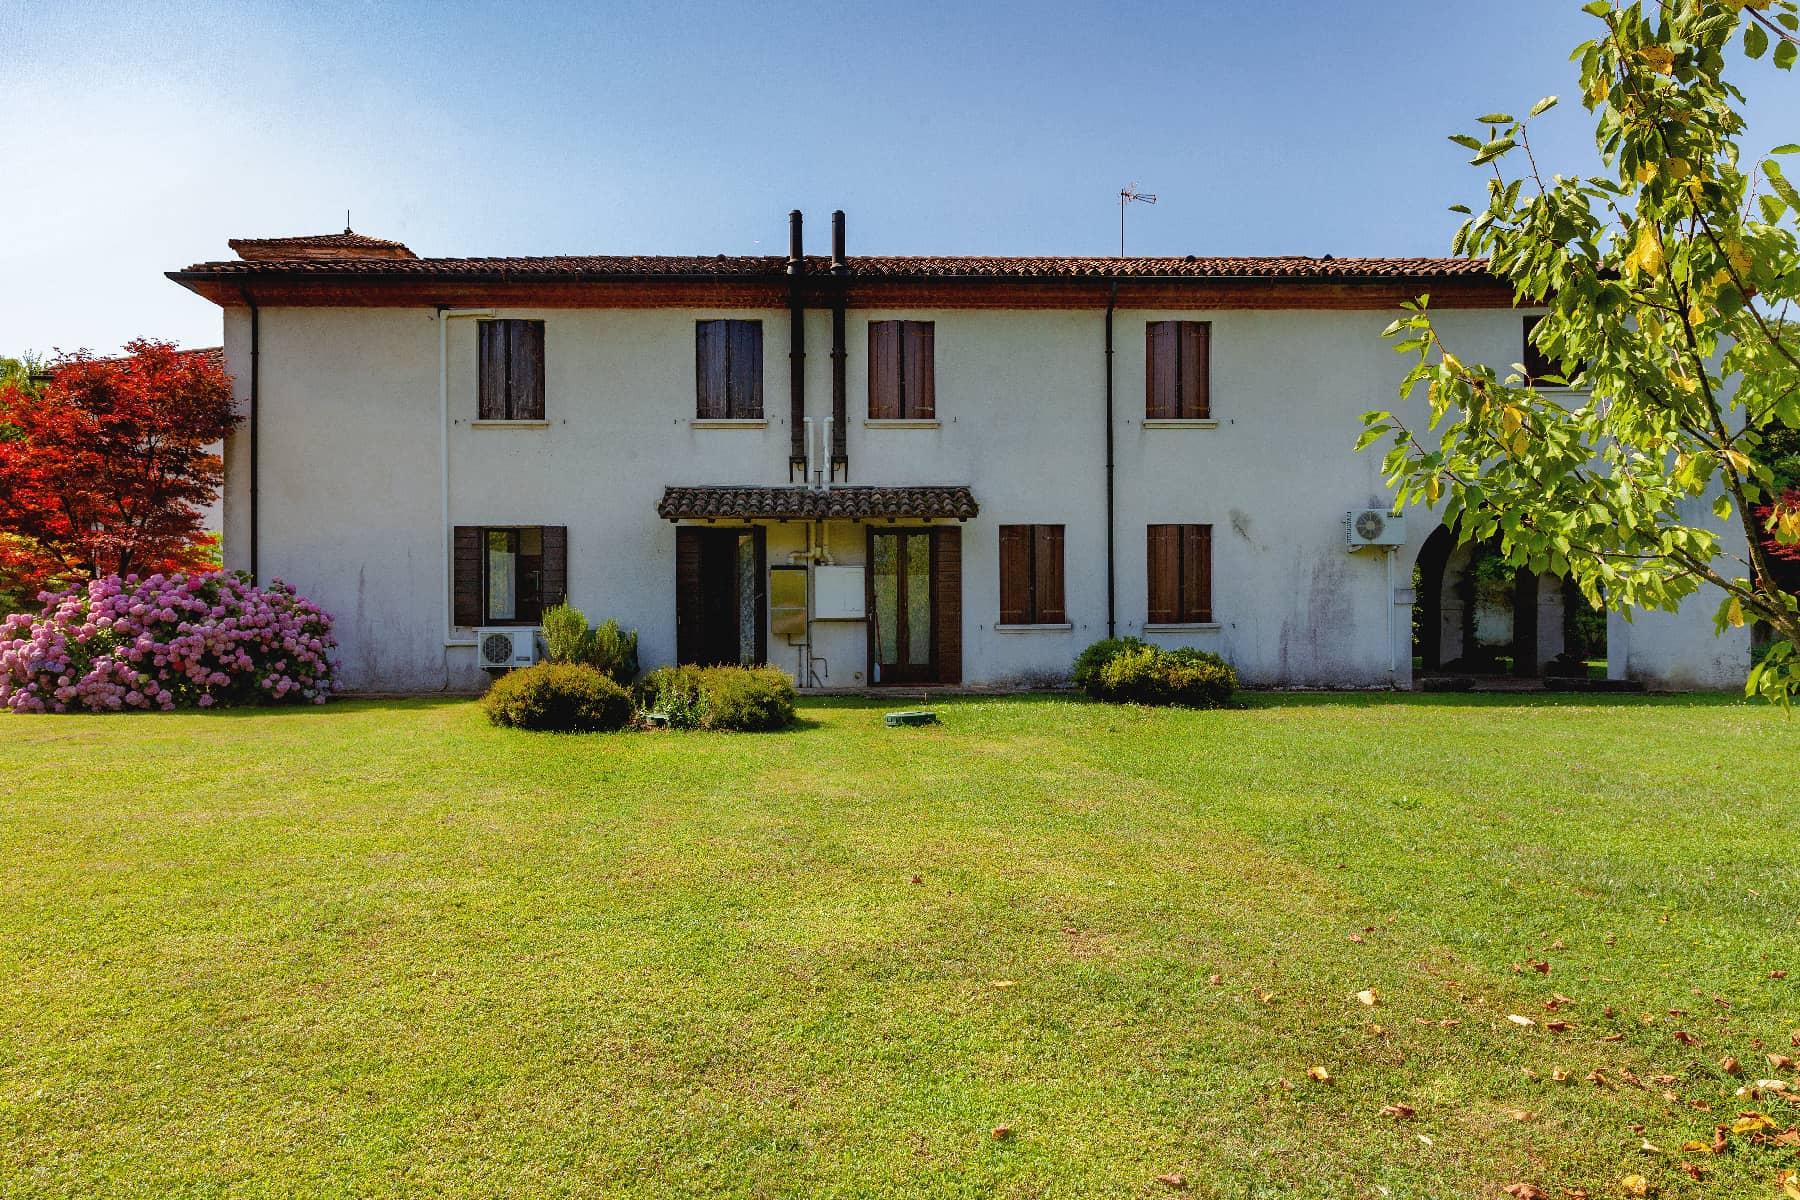 Villa in Vendita a Carbonera: 5 locali, 850 mq - Foto 17